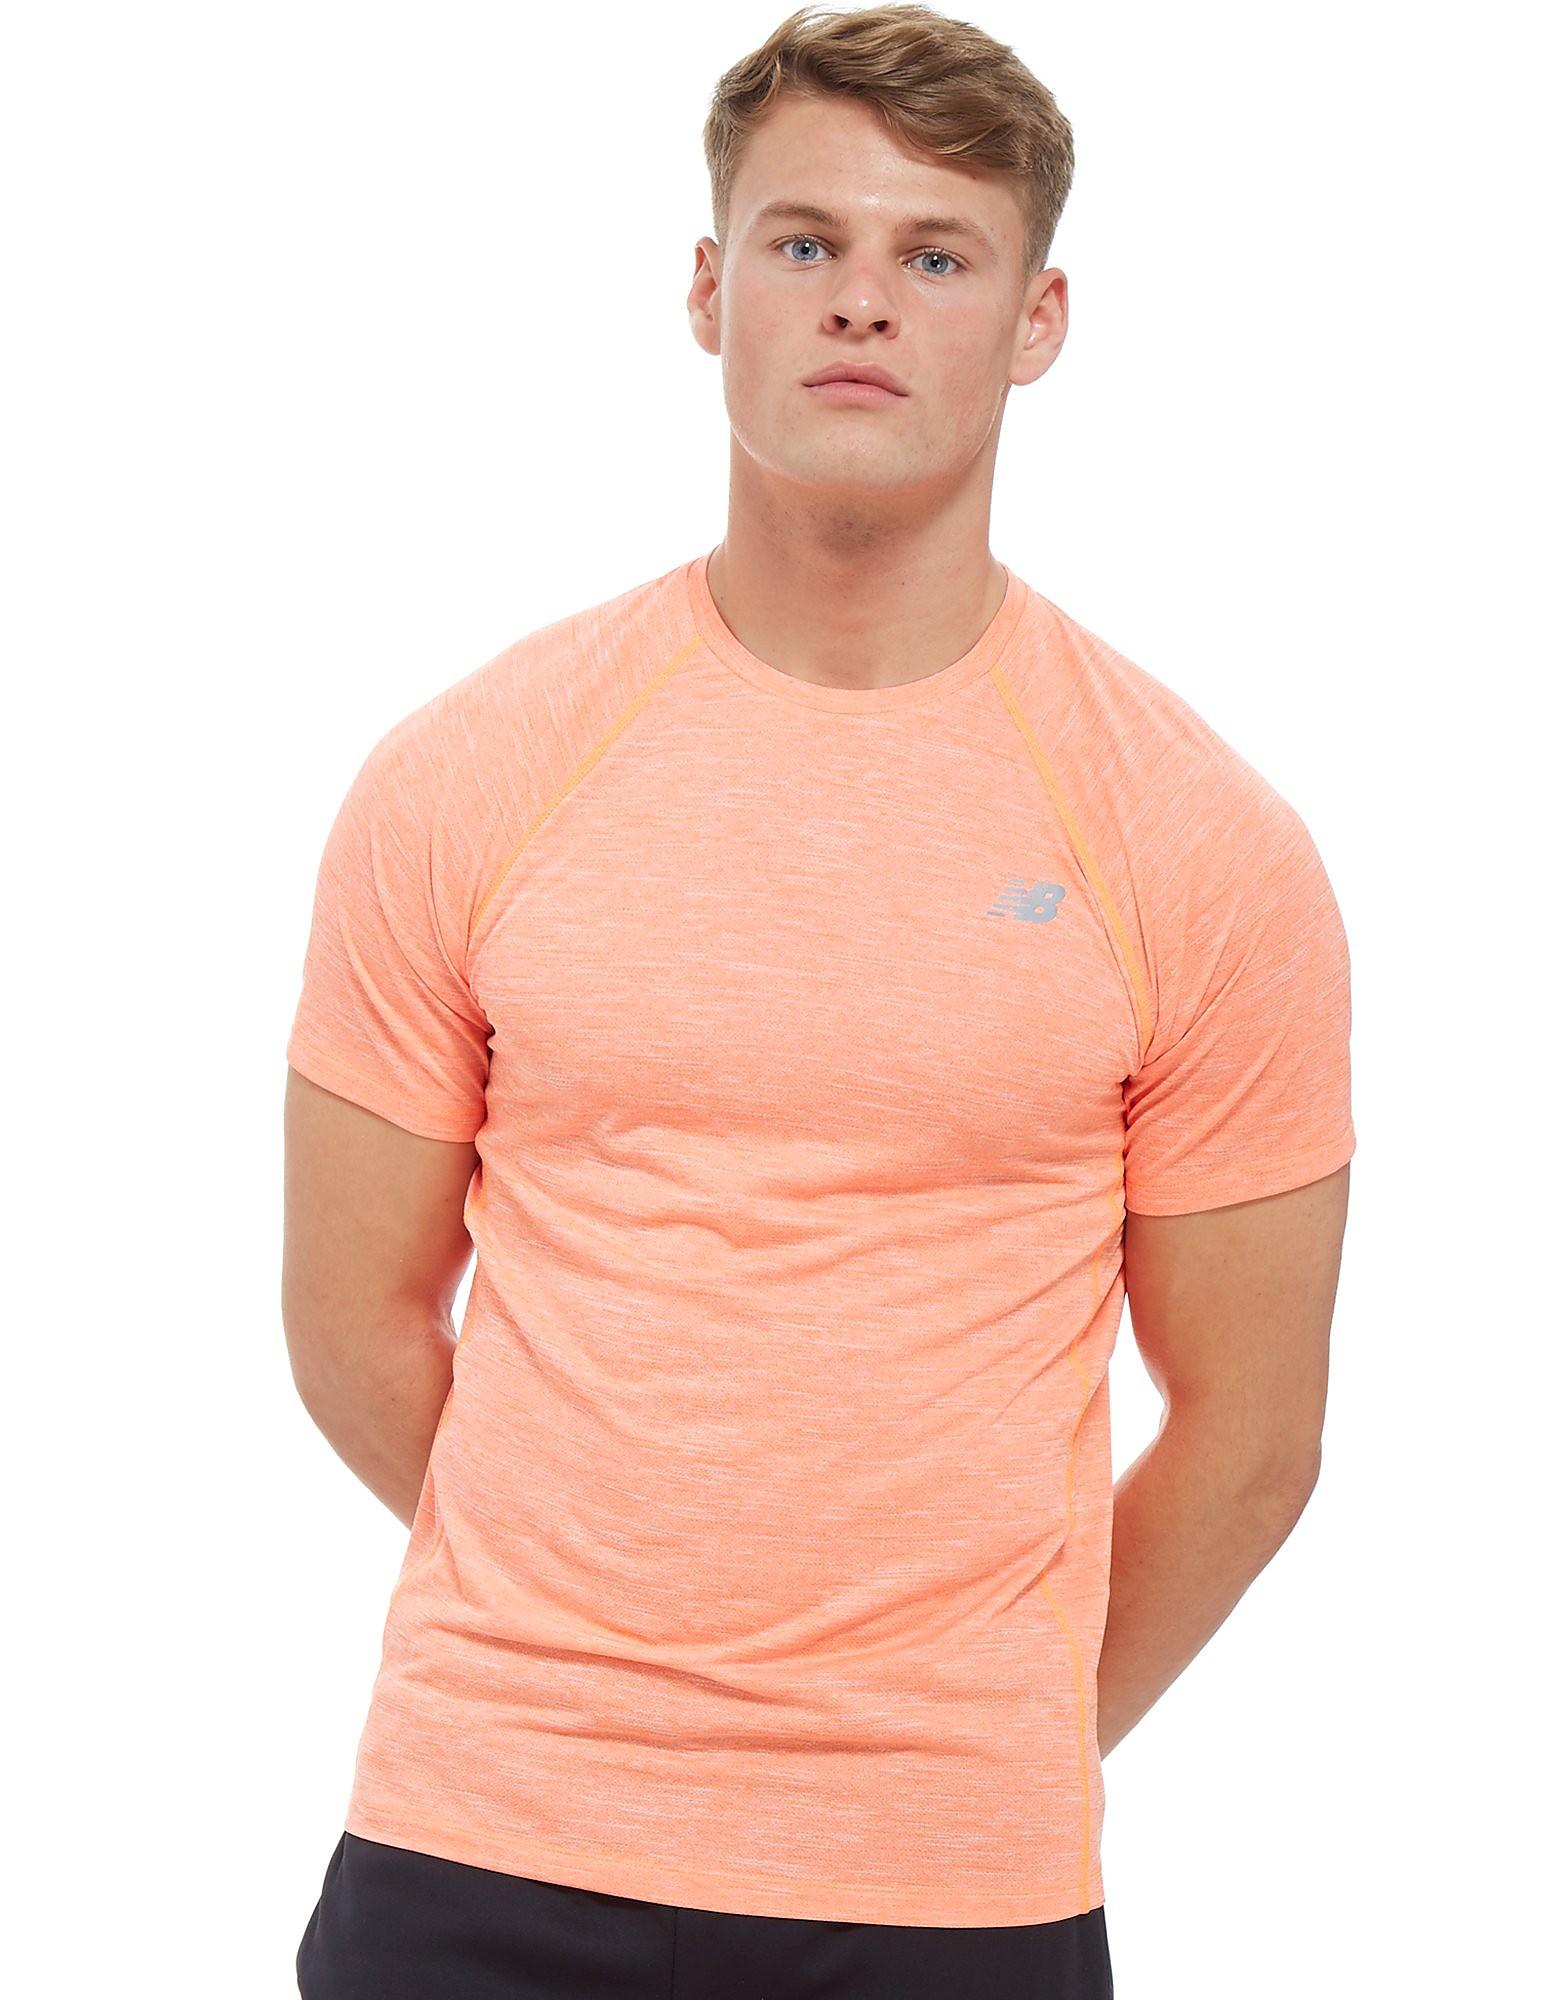 New Balance camiseta Tenacity